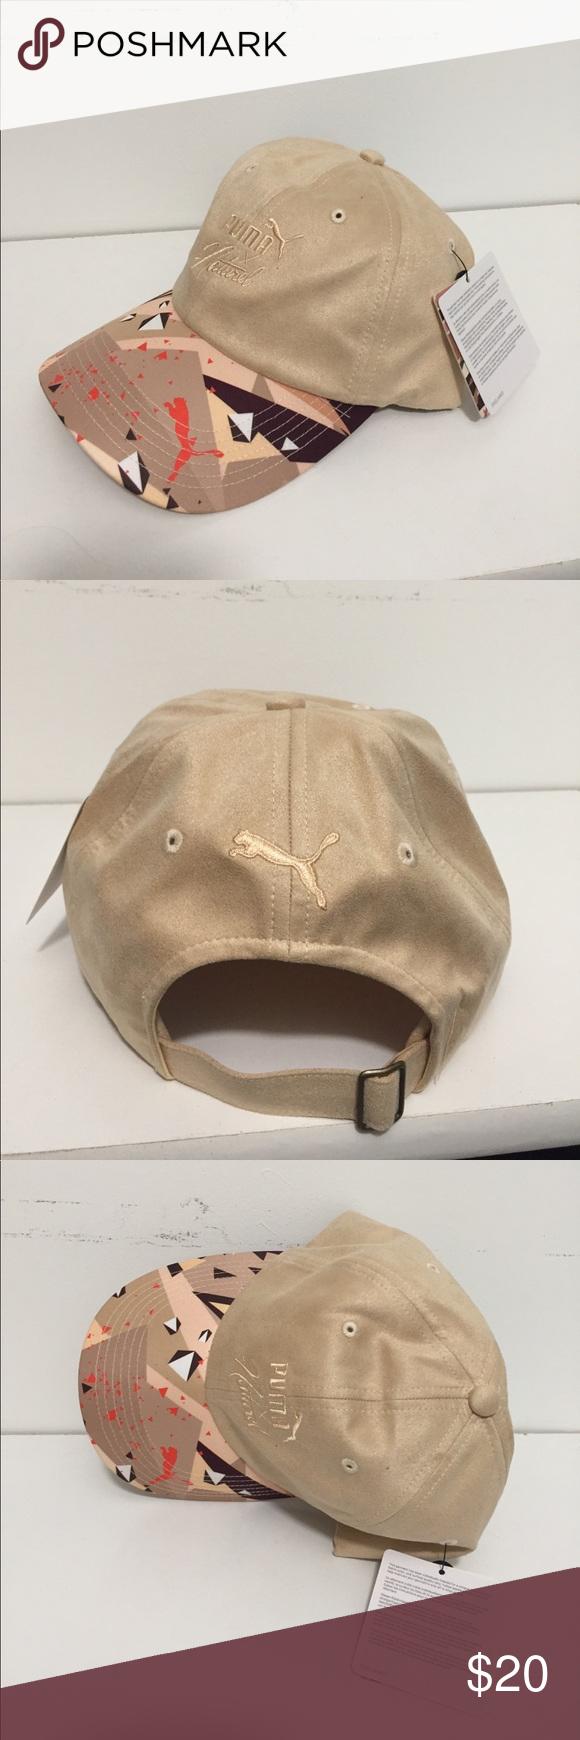 a9b3e22133da0f PUMA hat Natural collection NWT